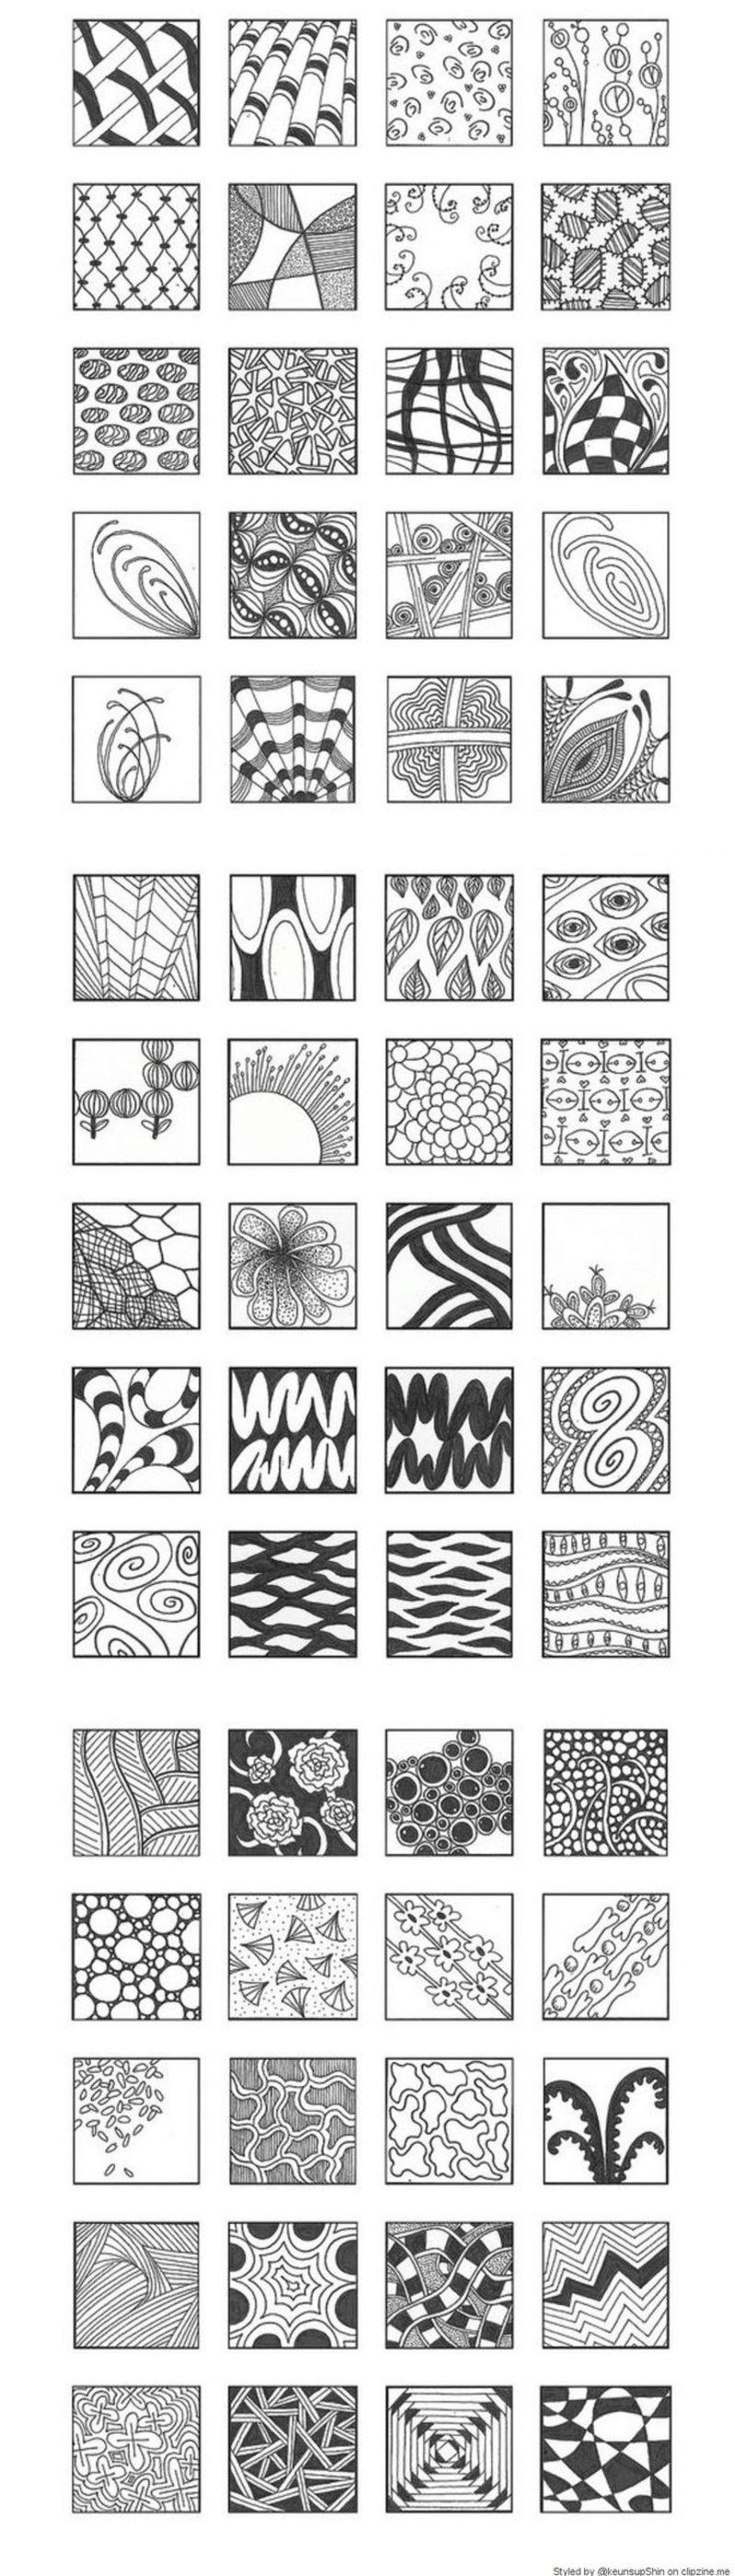 Official Zentangle Patterns Cool Design Inspiration